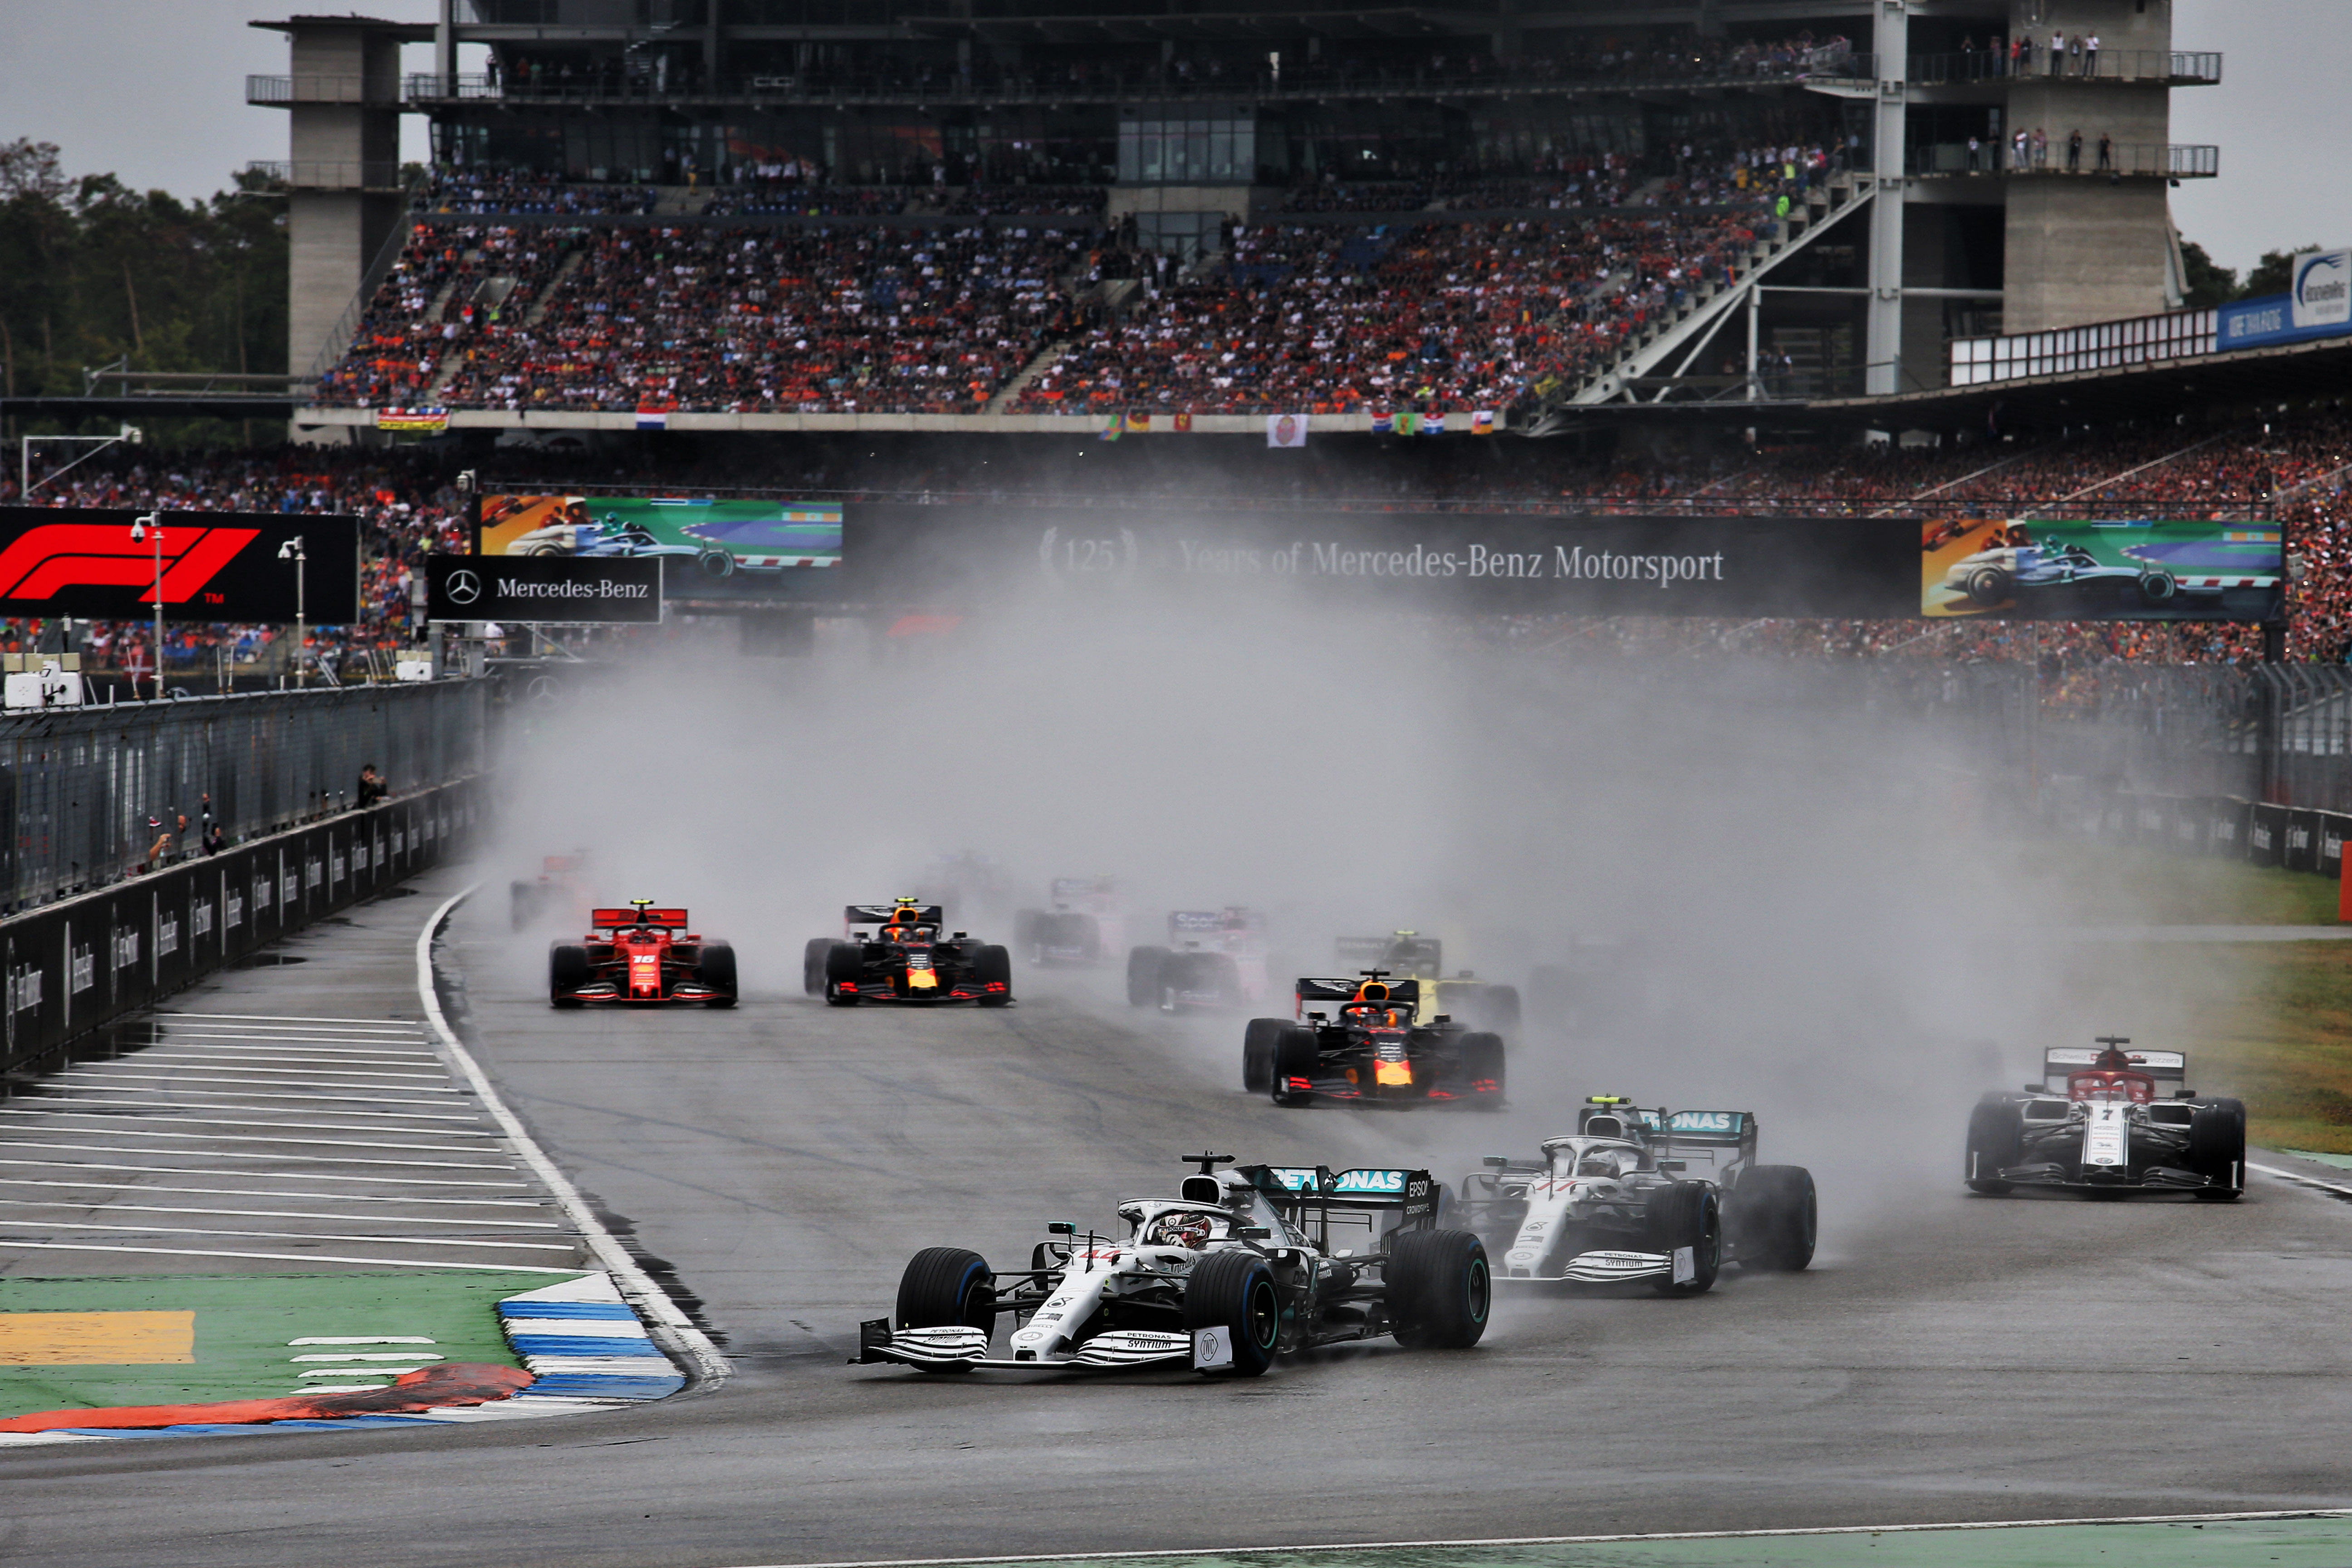 German Grand Prix 2019 Hockenheim